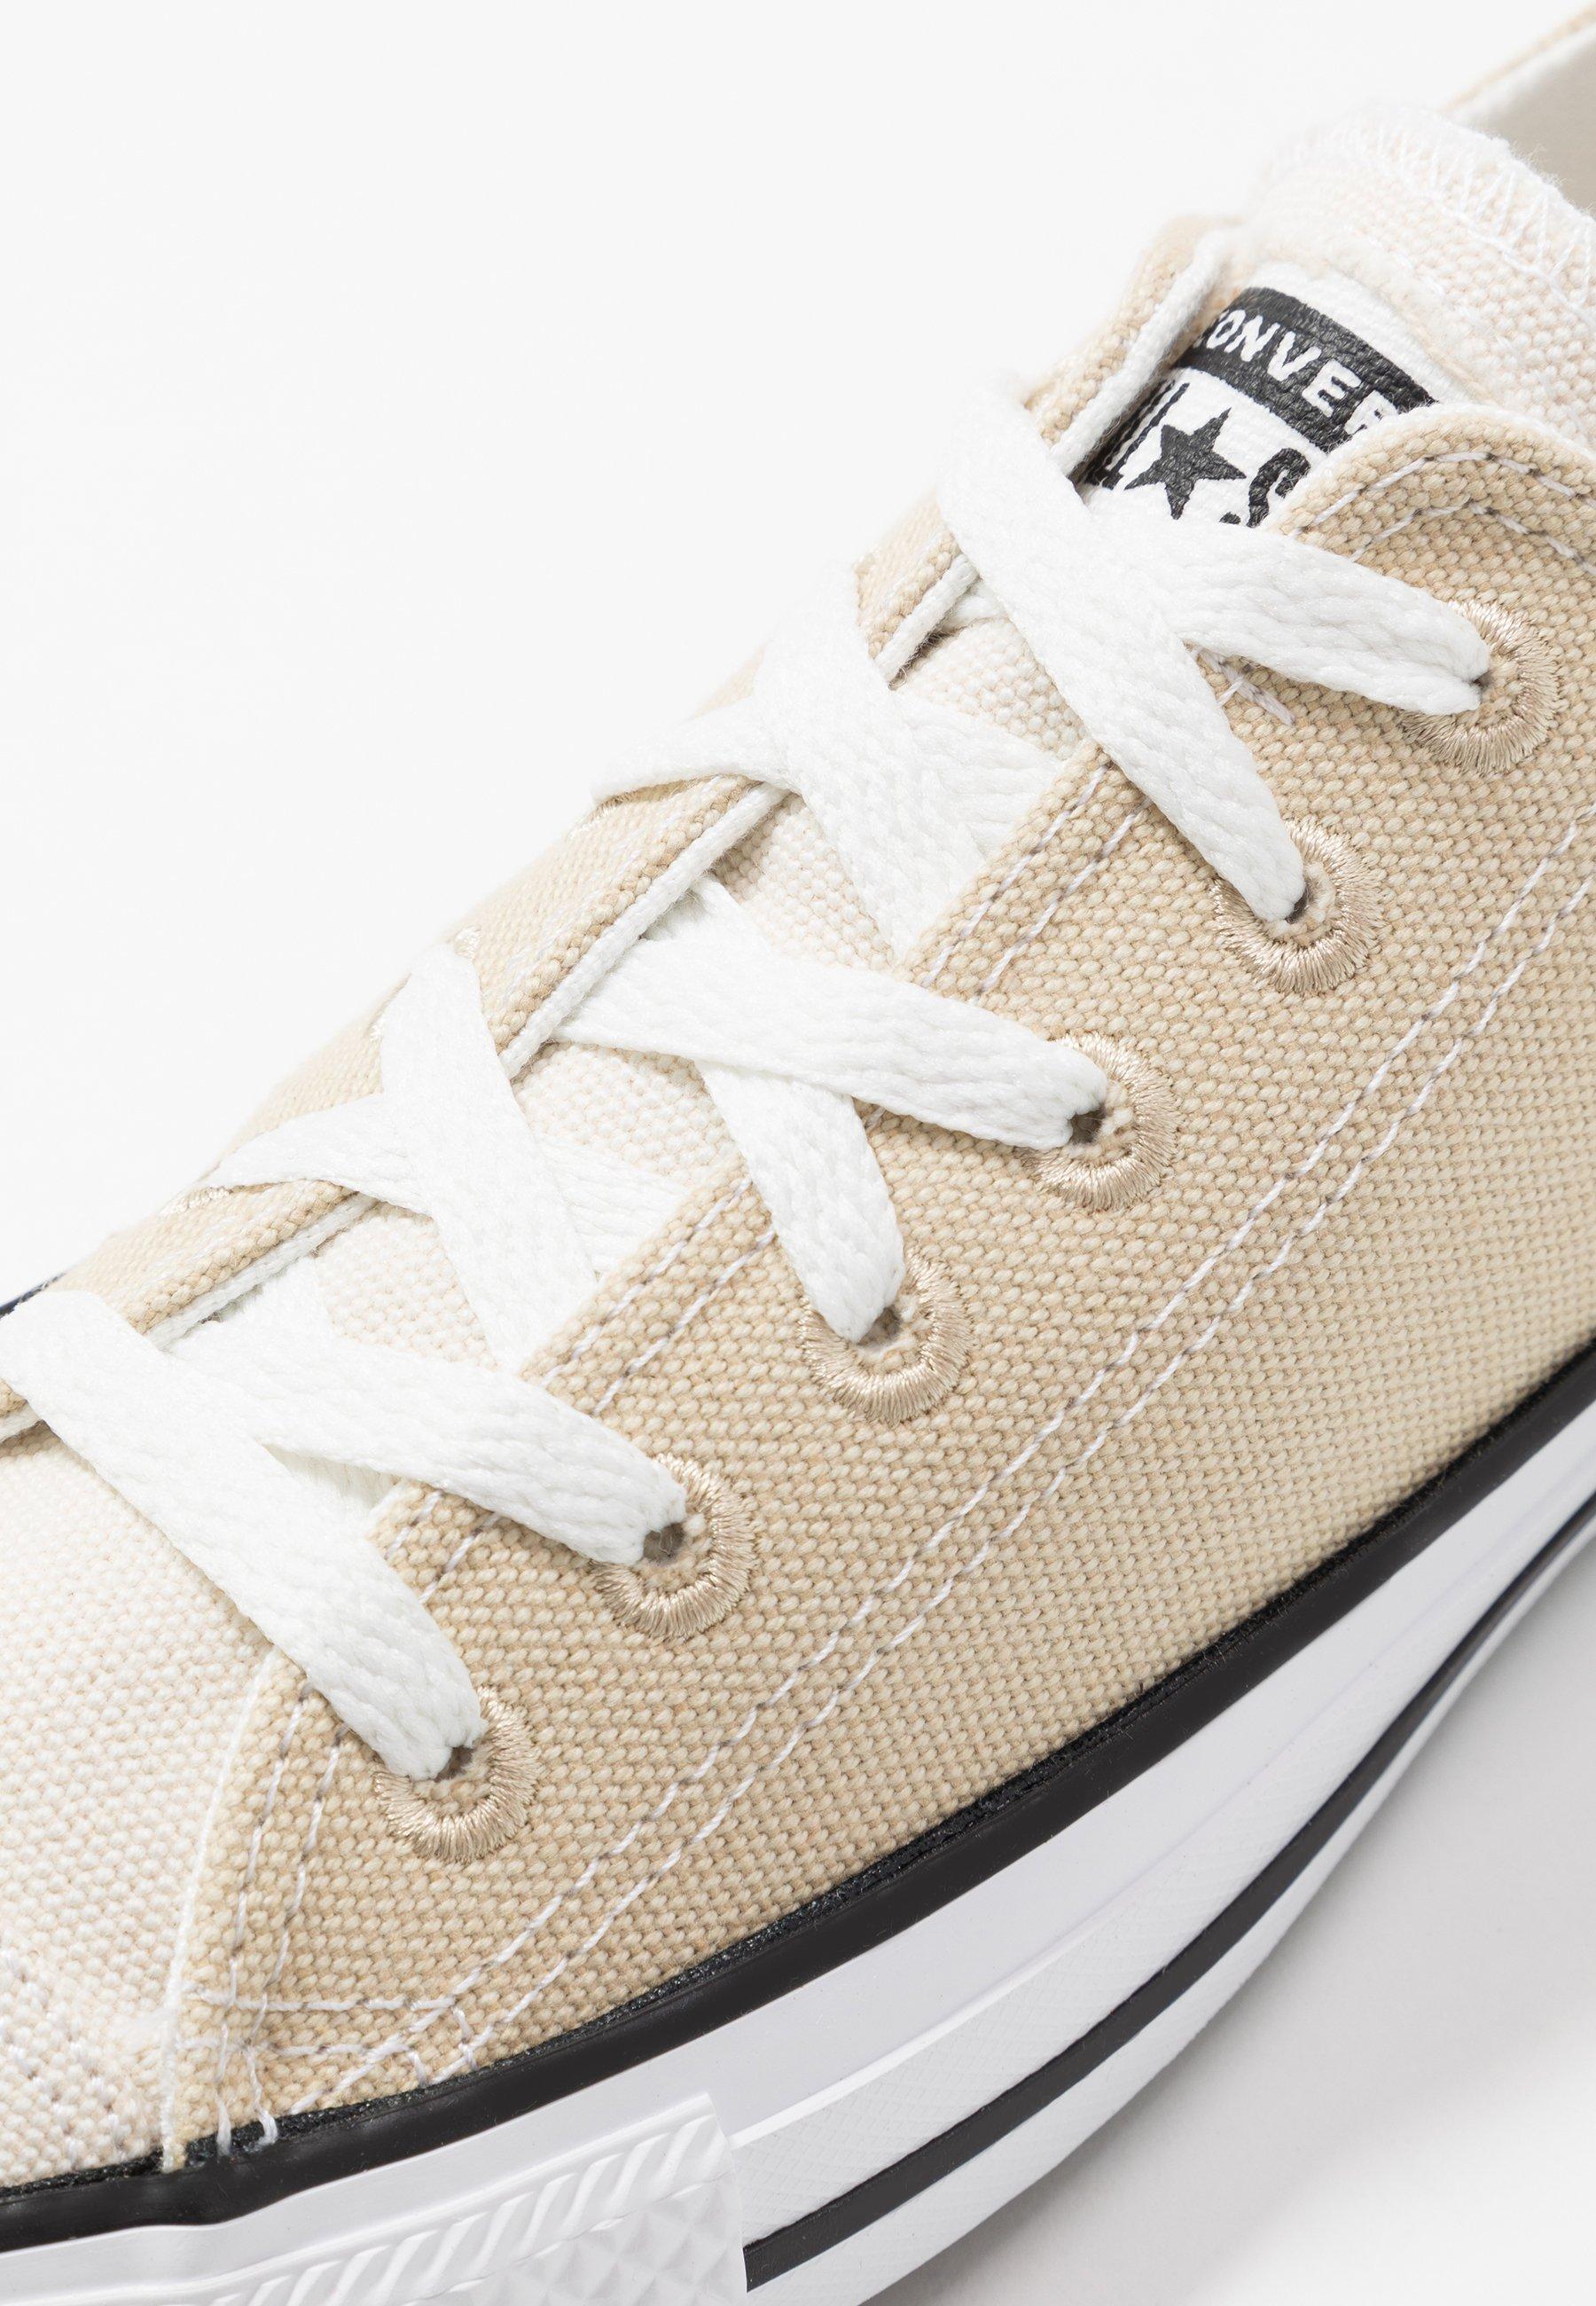 CHUCK TAYLOR ALL STAR OX RENEW Sneakers desert orenaturalblack